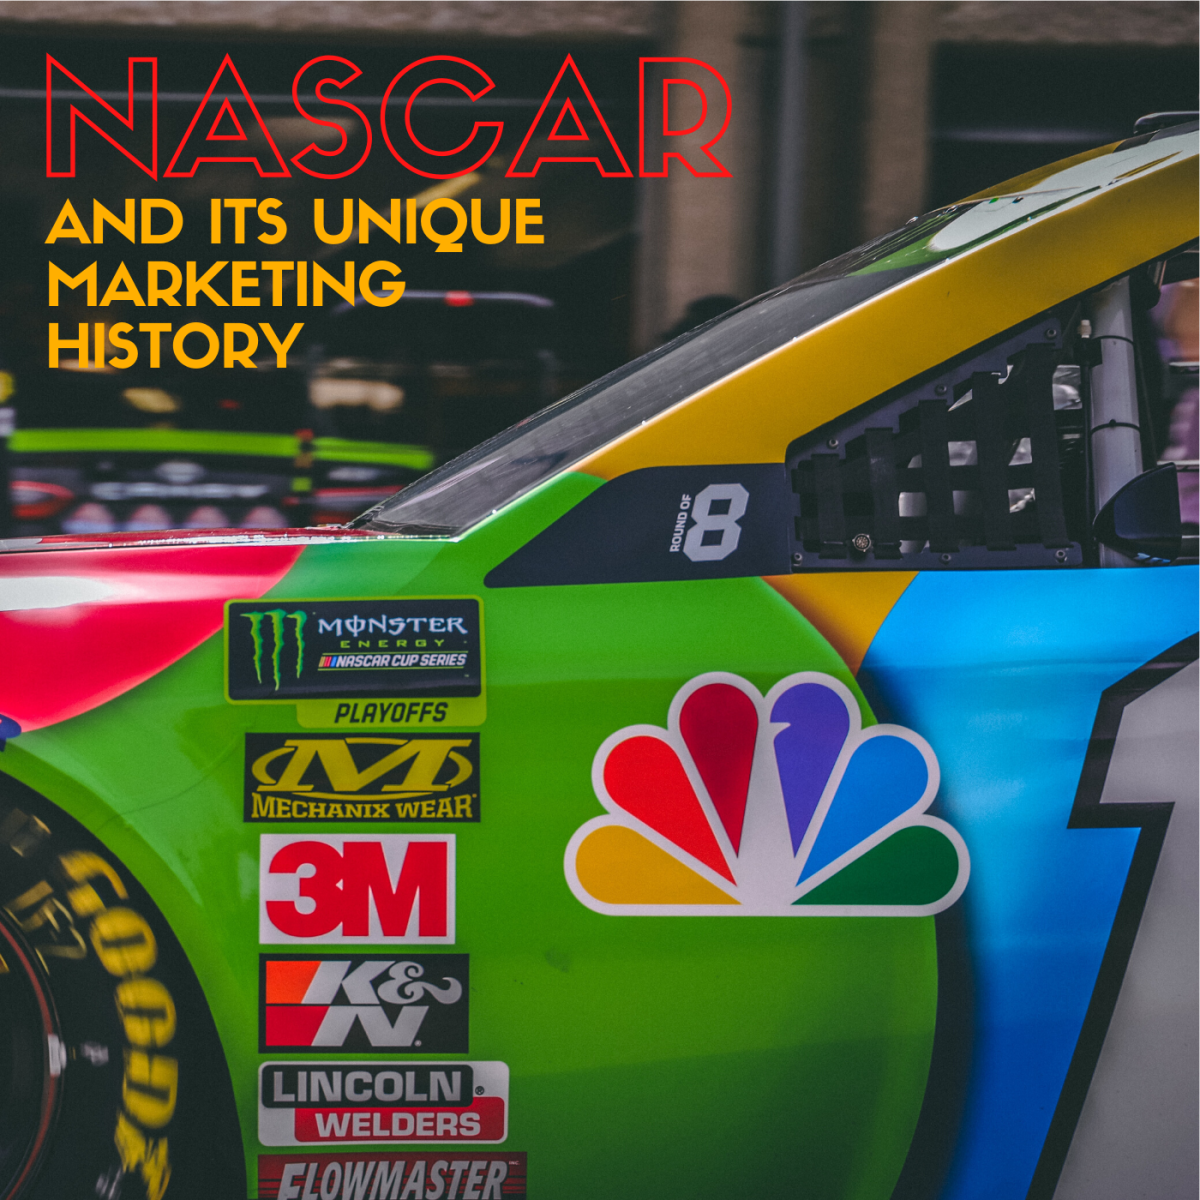 The Evolution of NASCAR Marketing